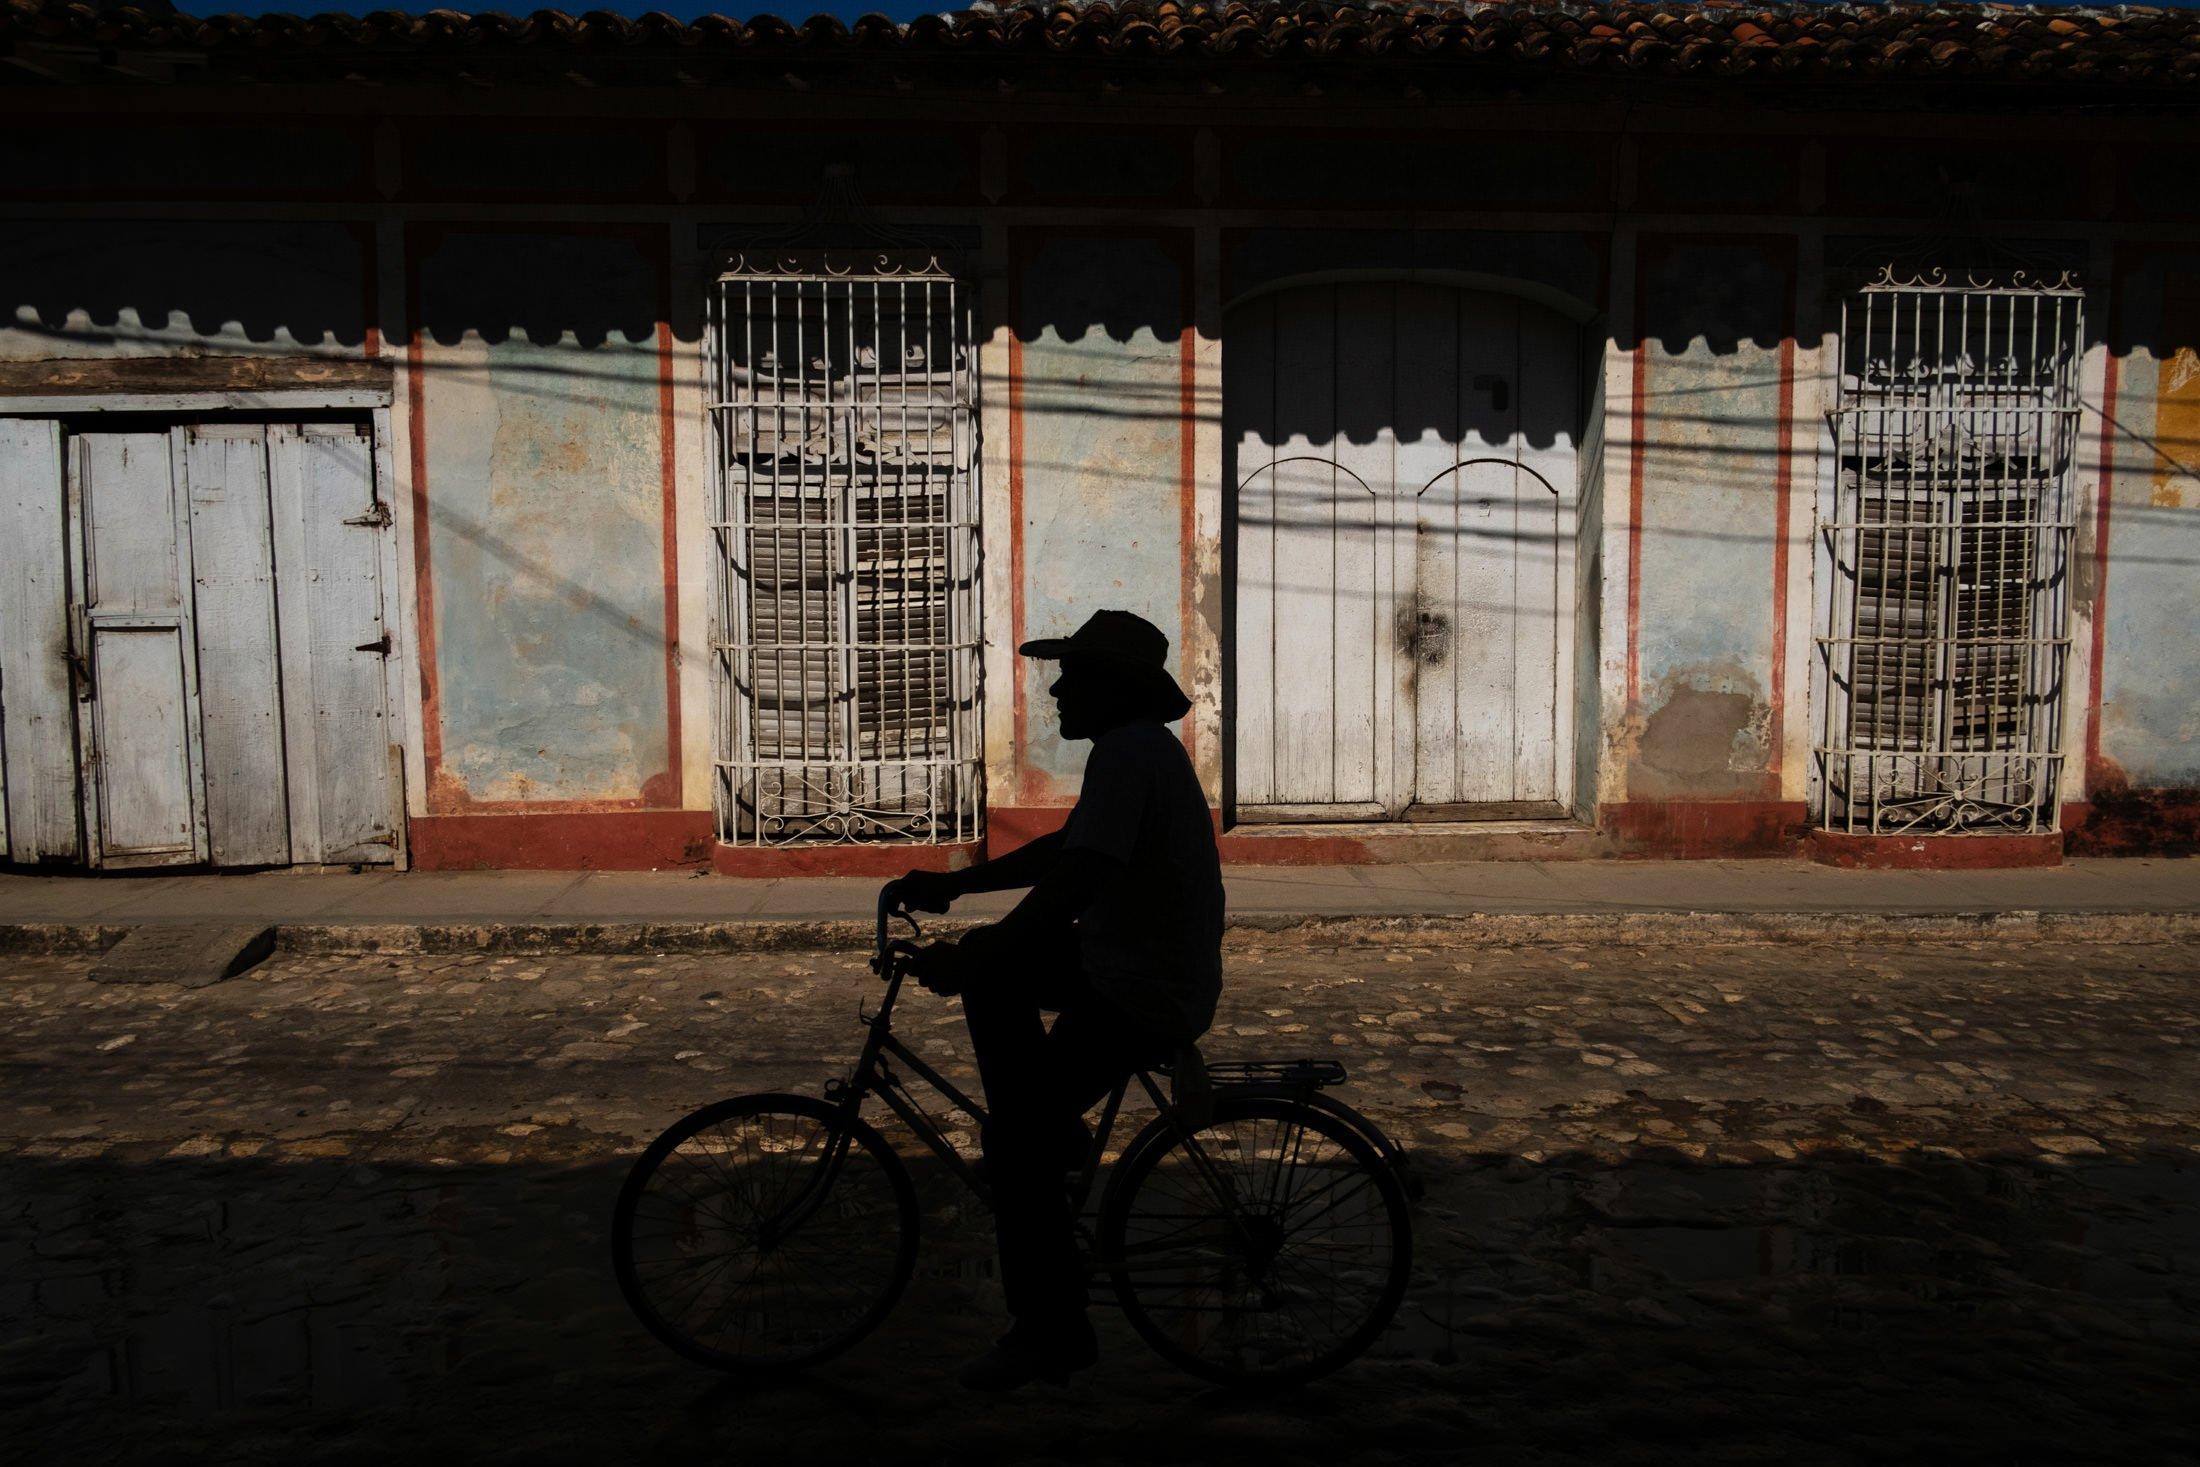 silhouette of a man riding a bike